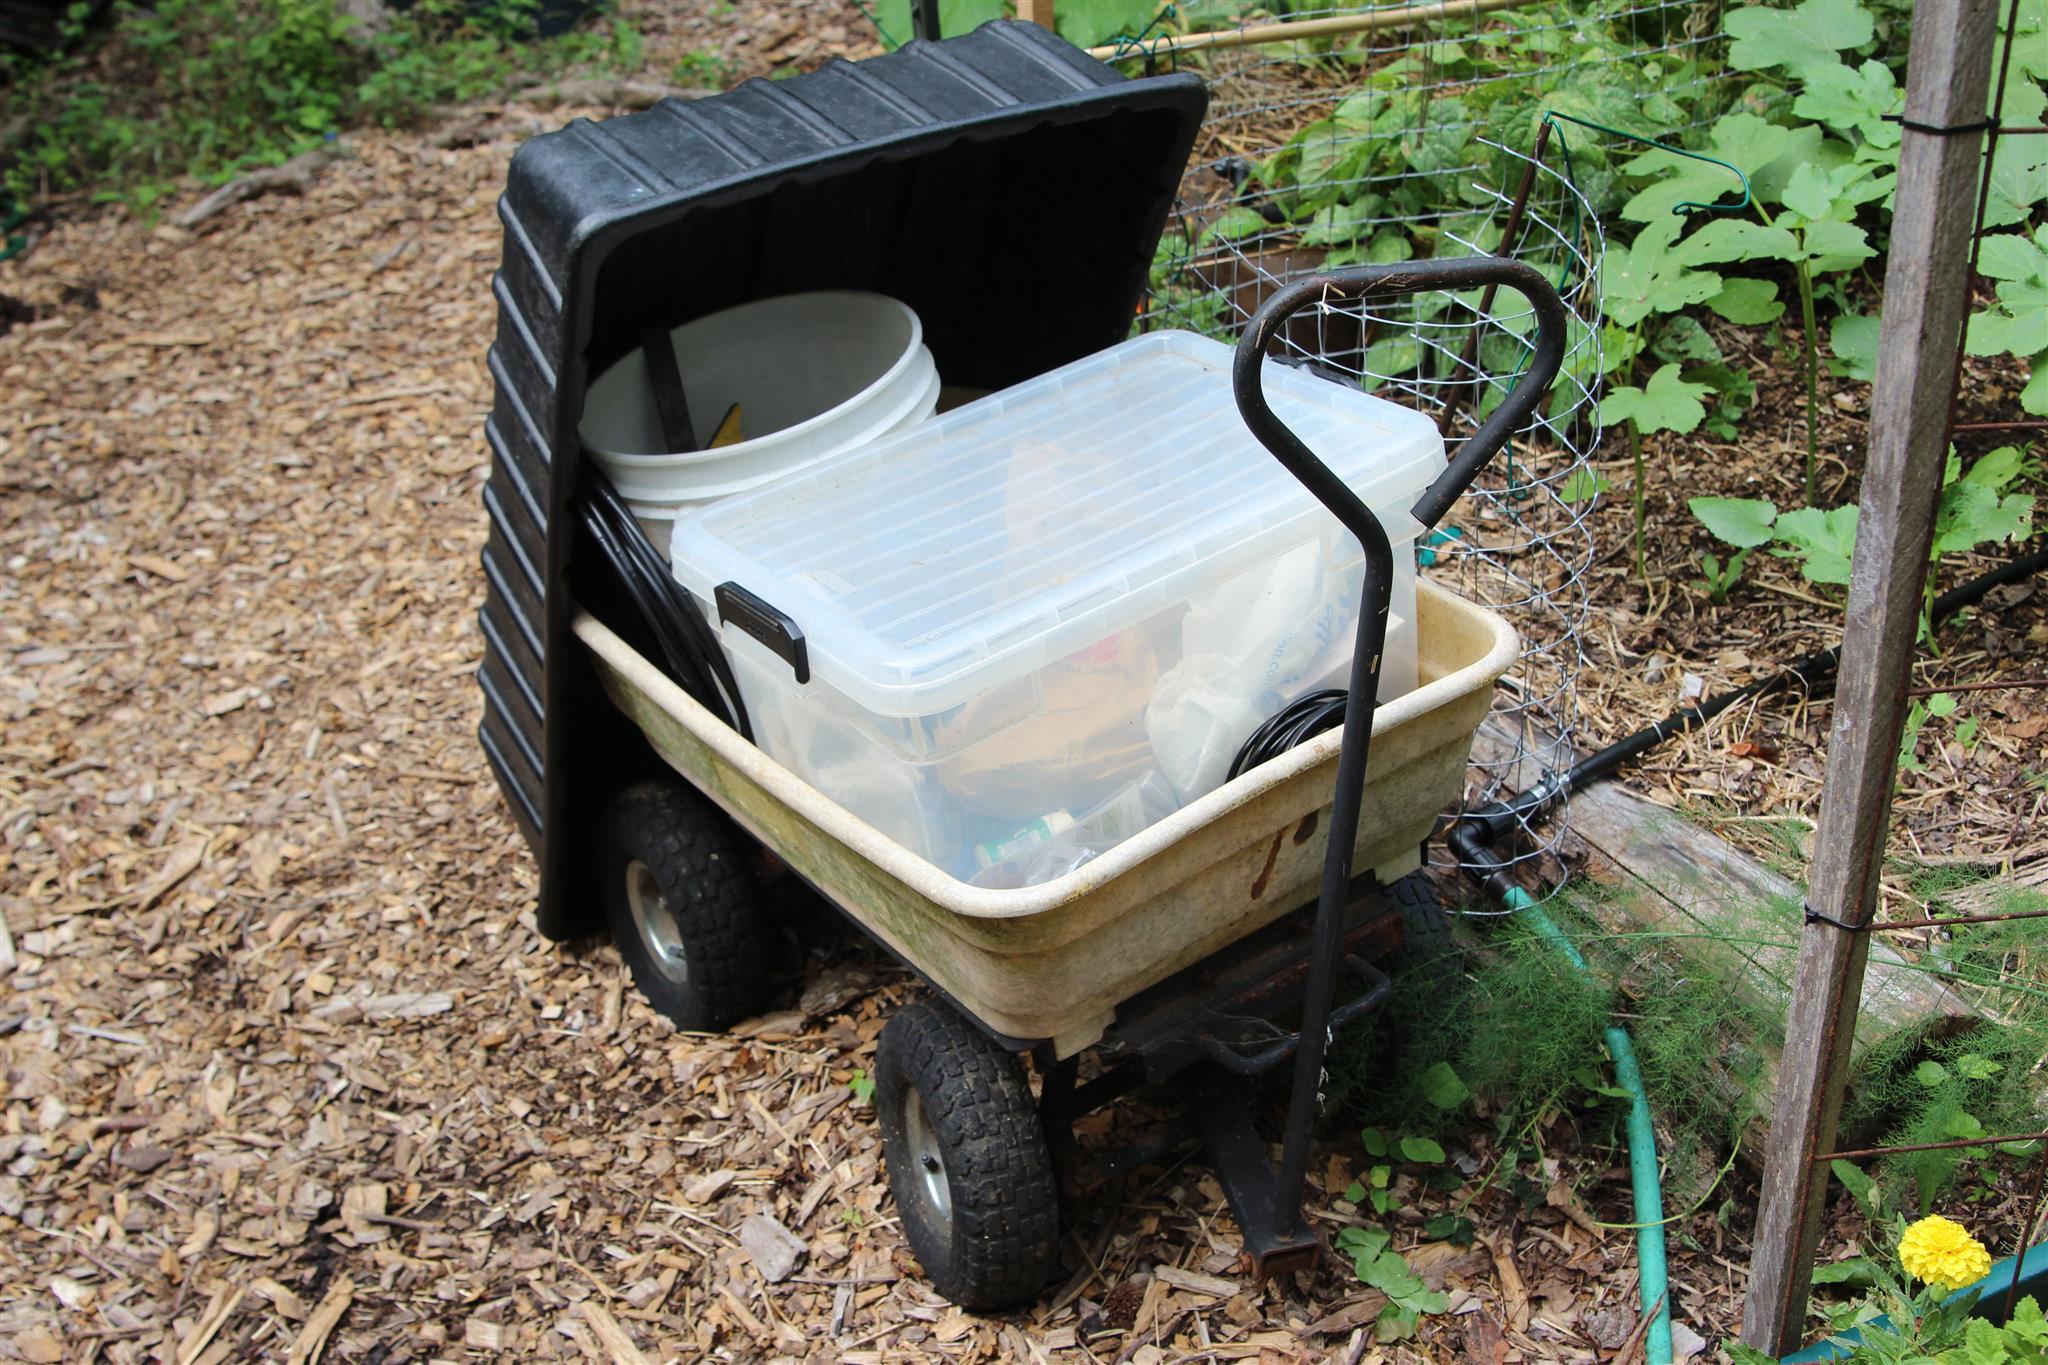 gorilla garden cart,